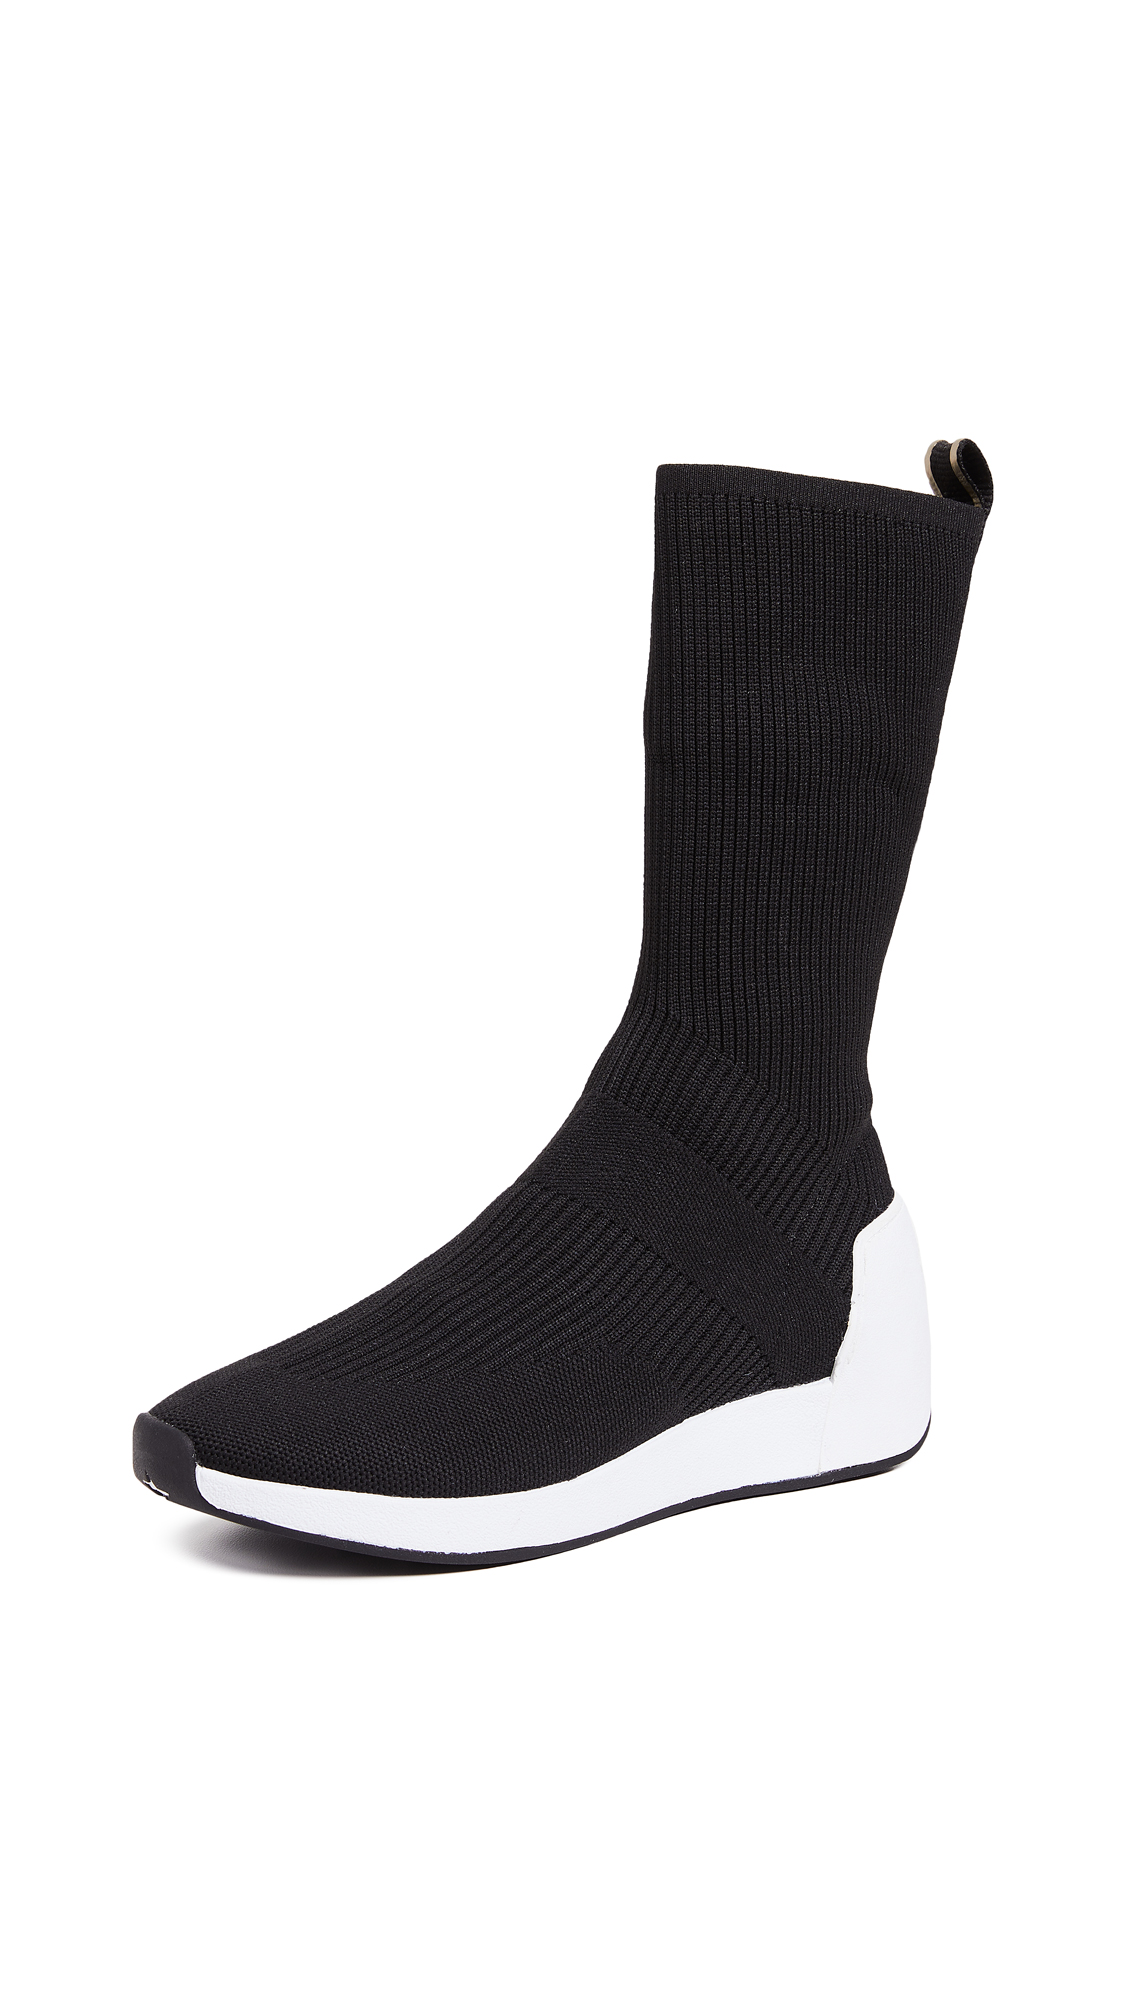 Ash Jay Tall Knit Runners - Black